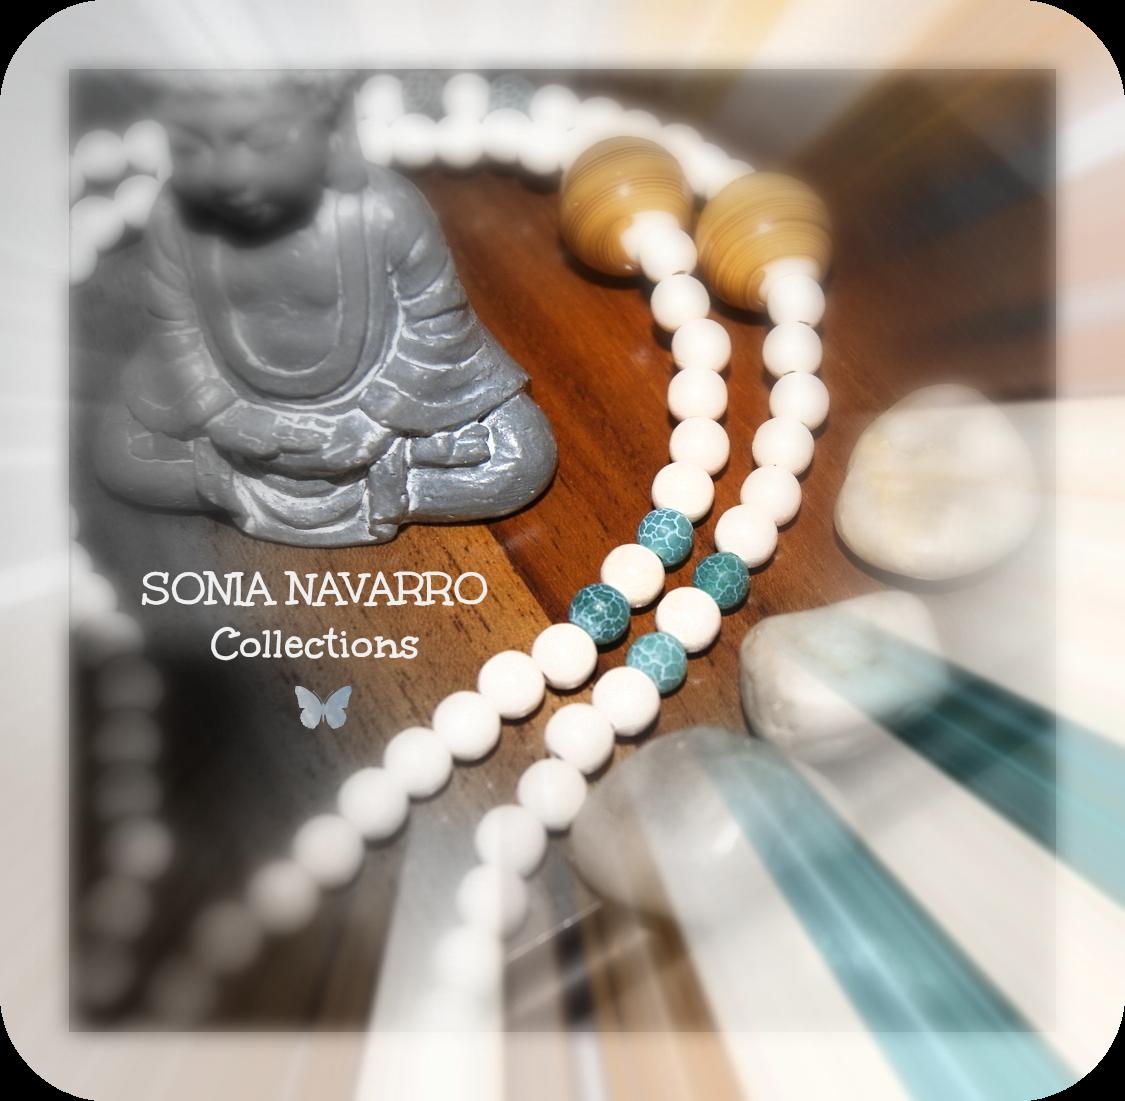 SONIA NAVARRO Collections